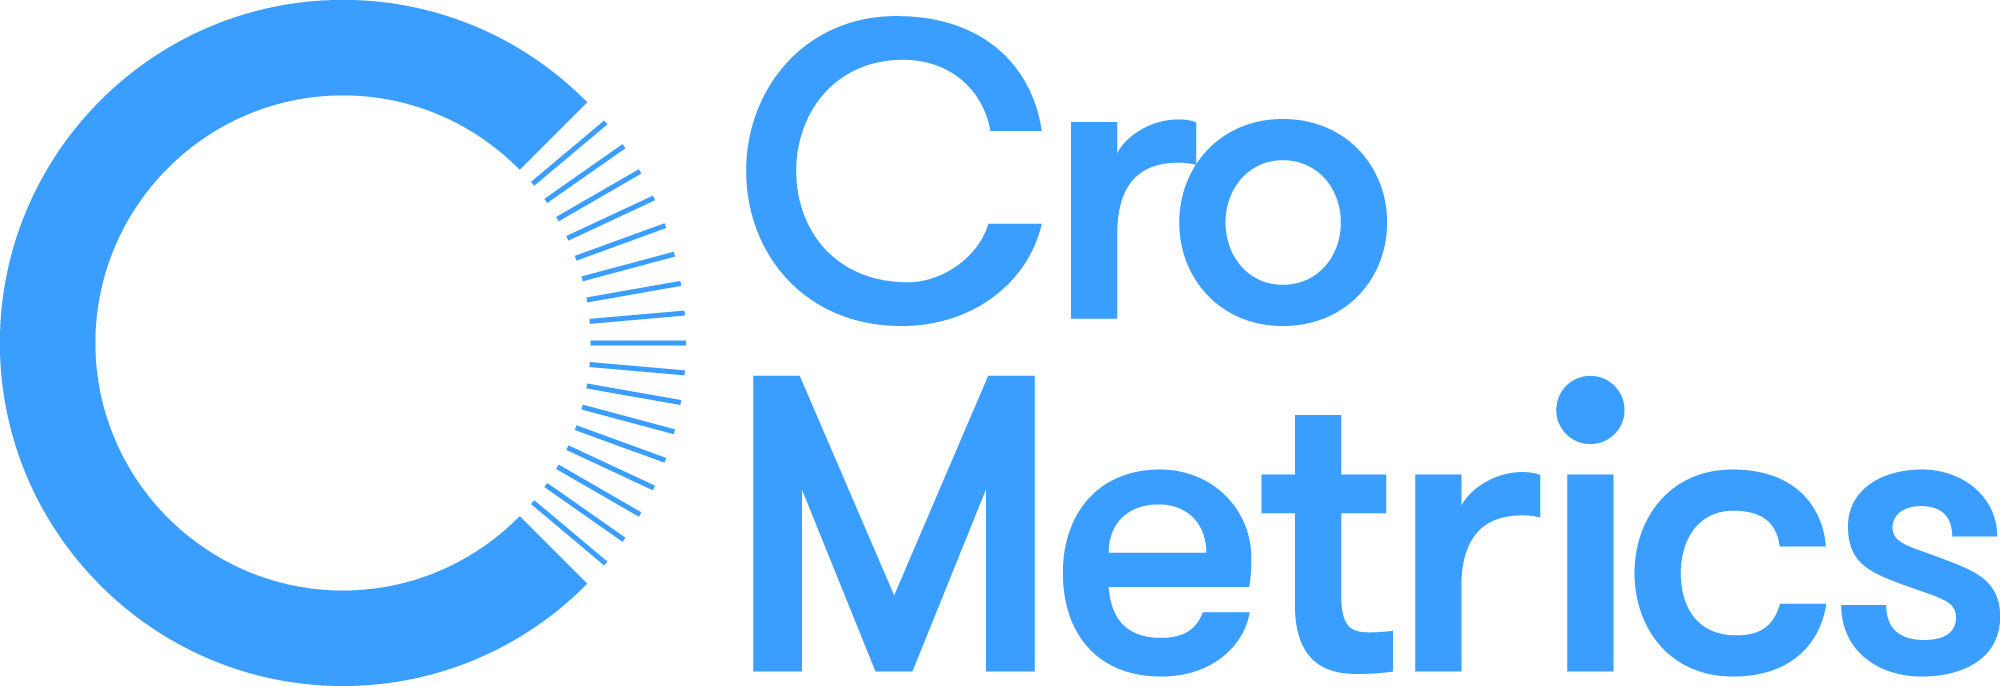 CRO Metrics logo